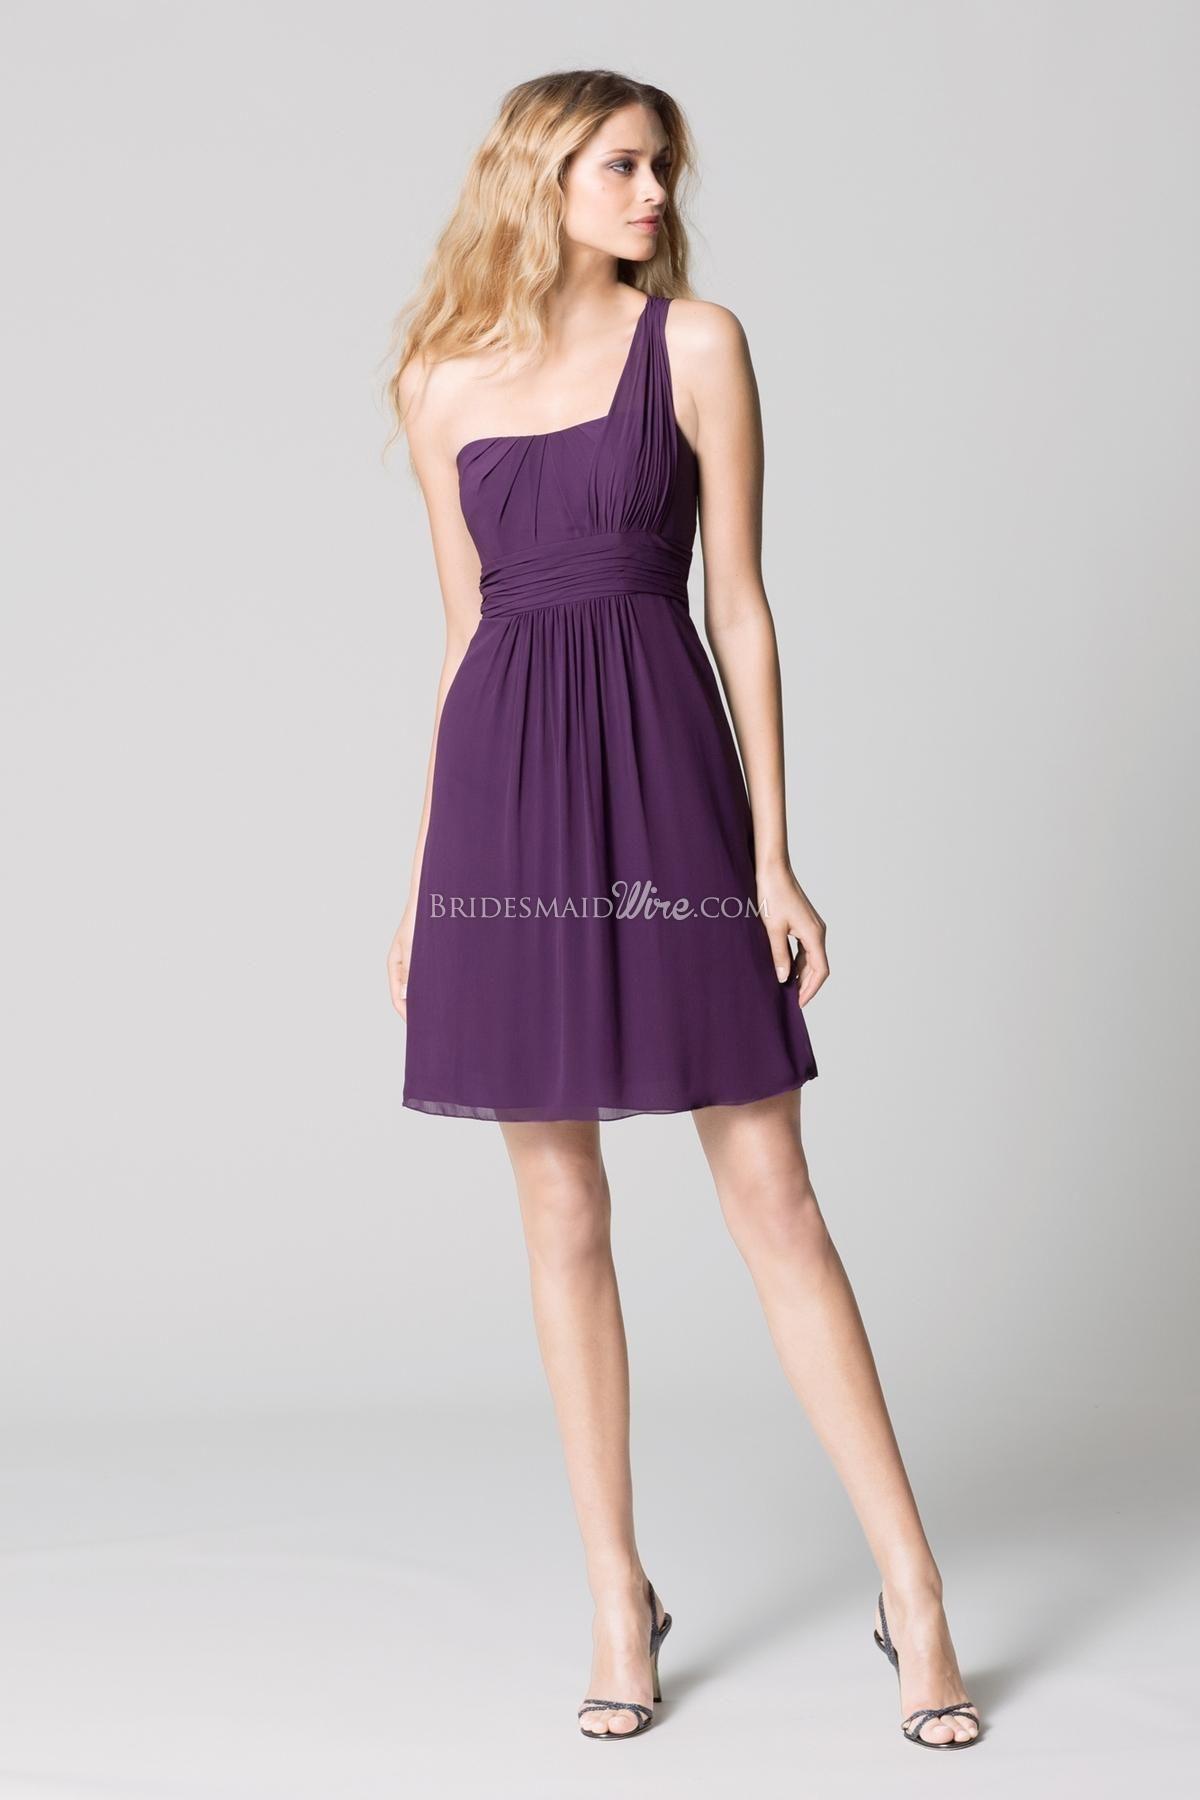 plum crinkle chiffon one-shoulder draped knee length bridesmaid dress